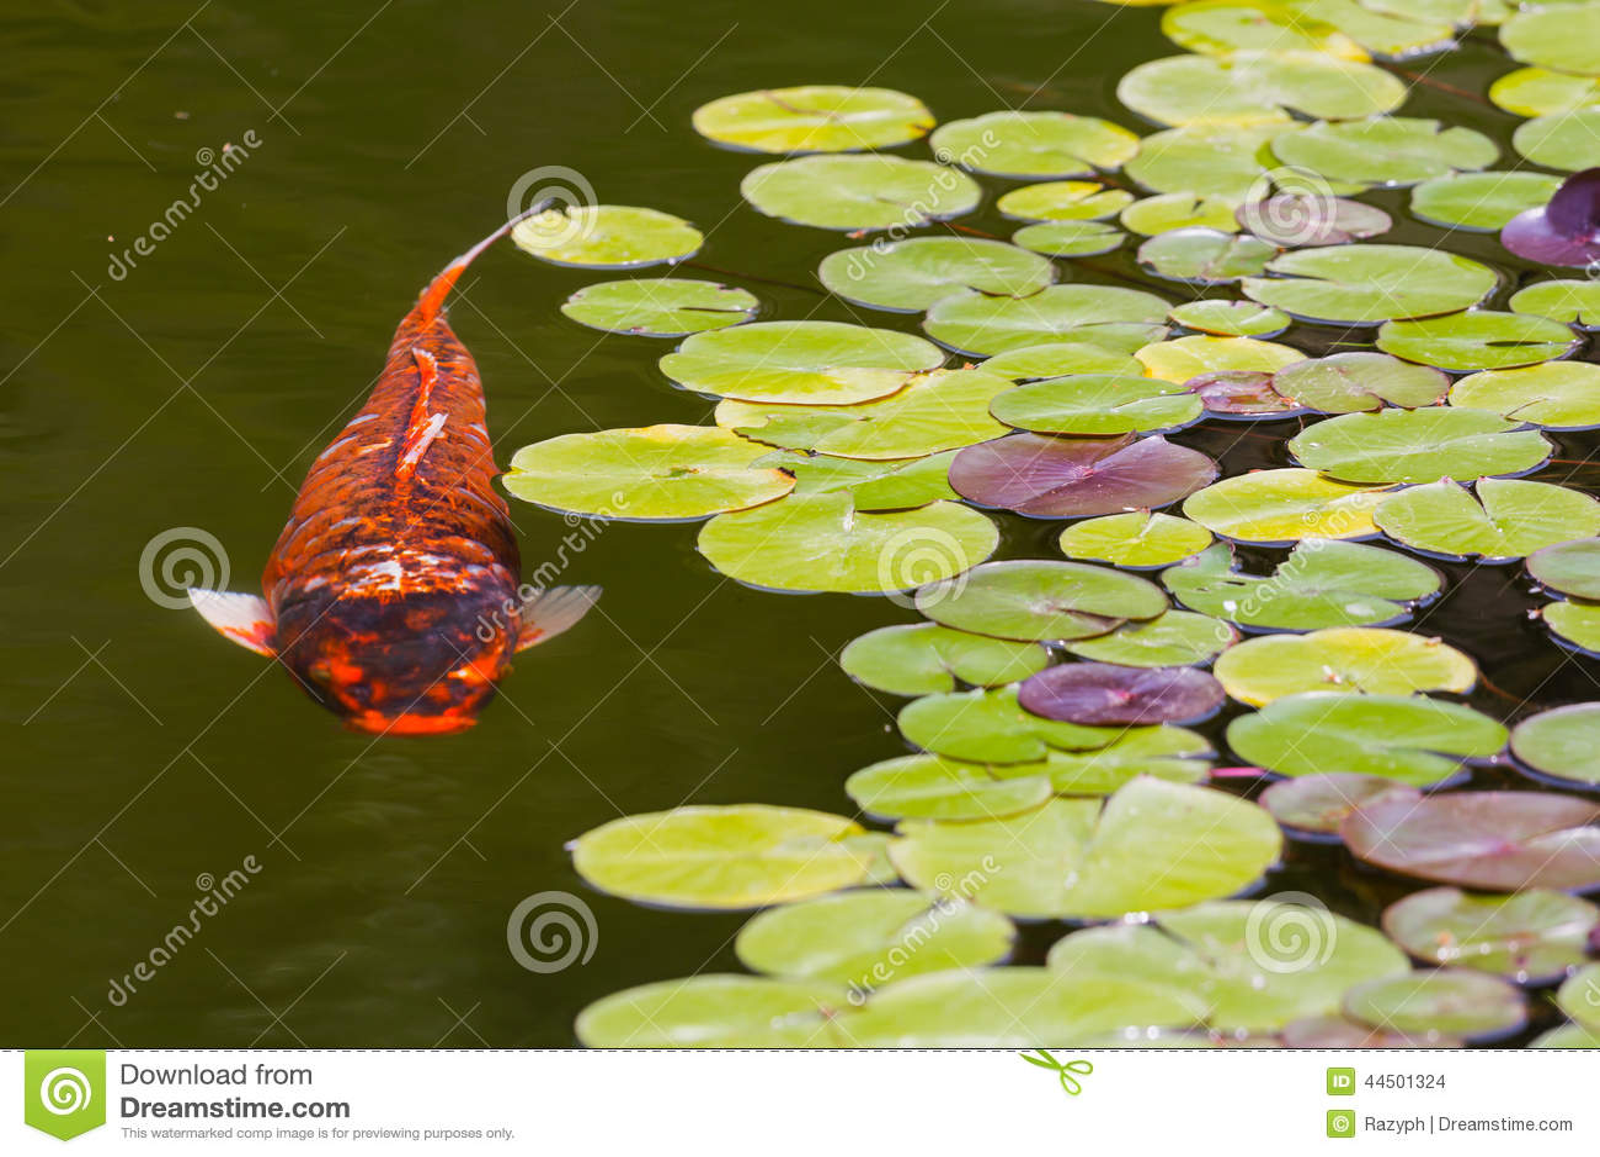 Koi Fish Stock Photo Image 44501324